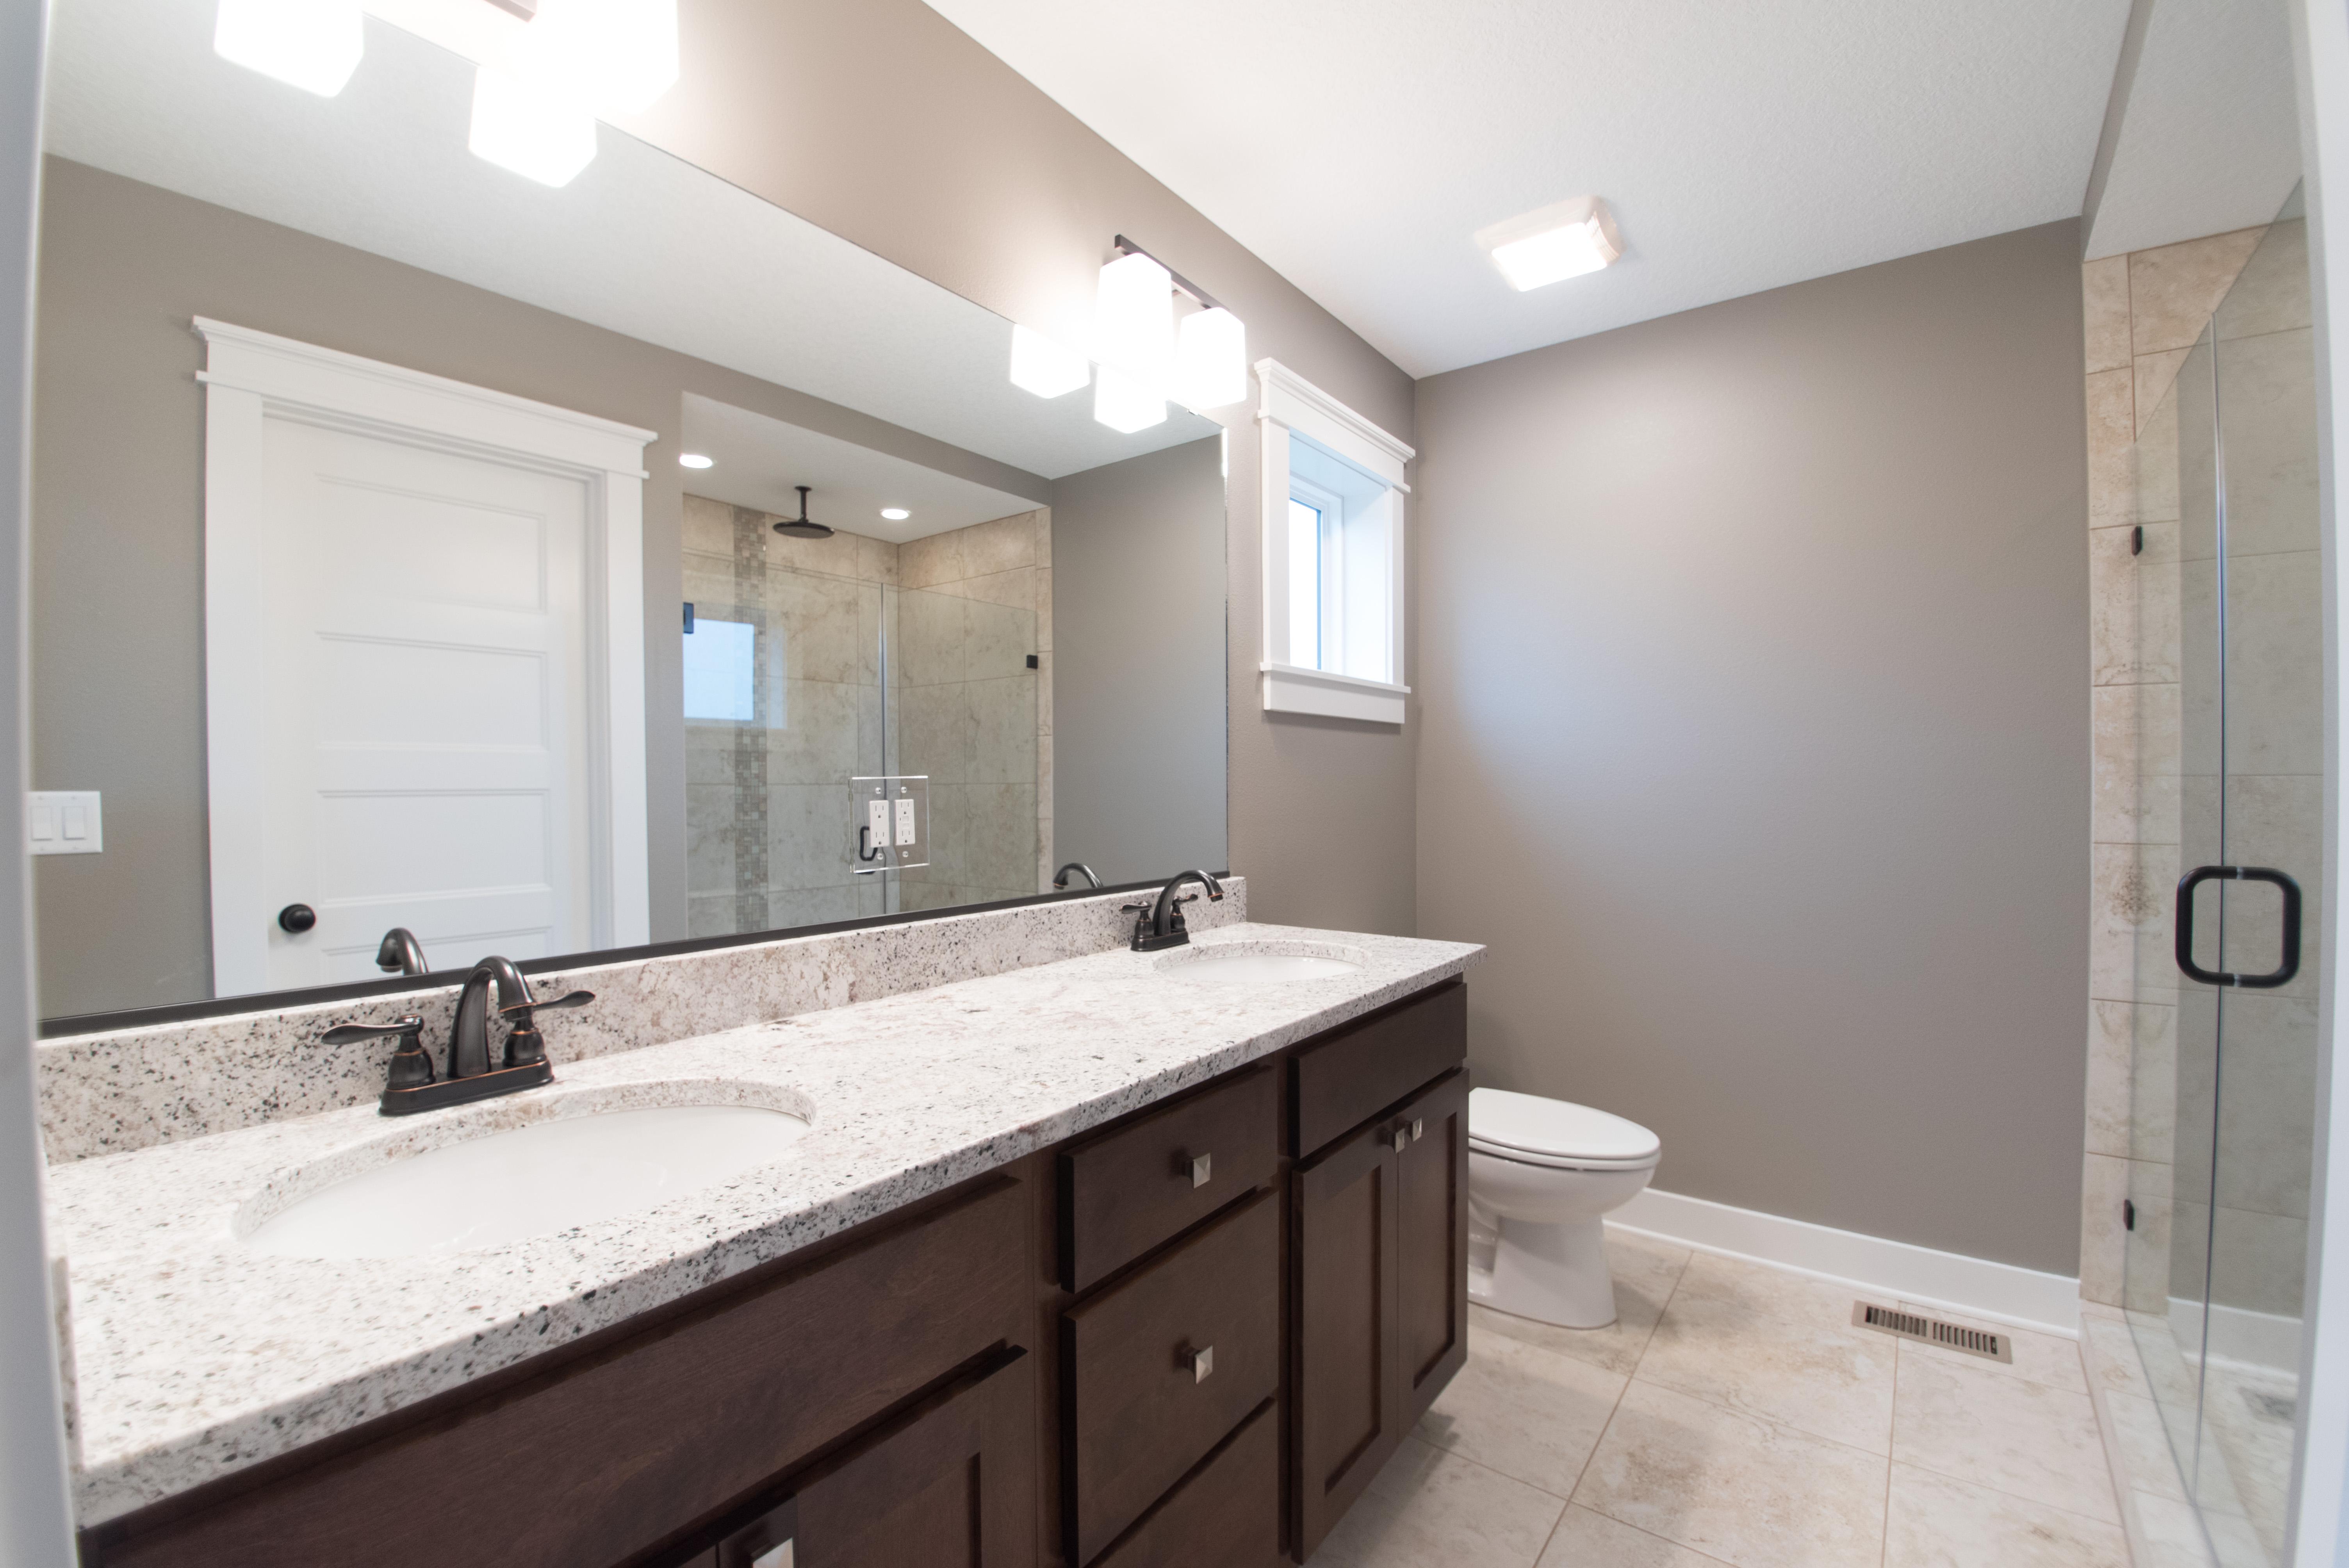 Rosewood Bathroom